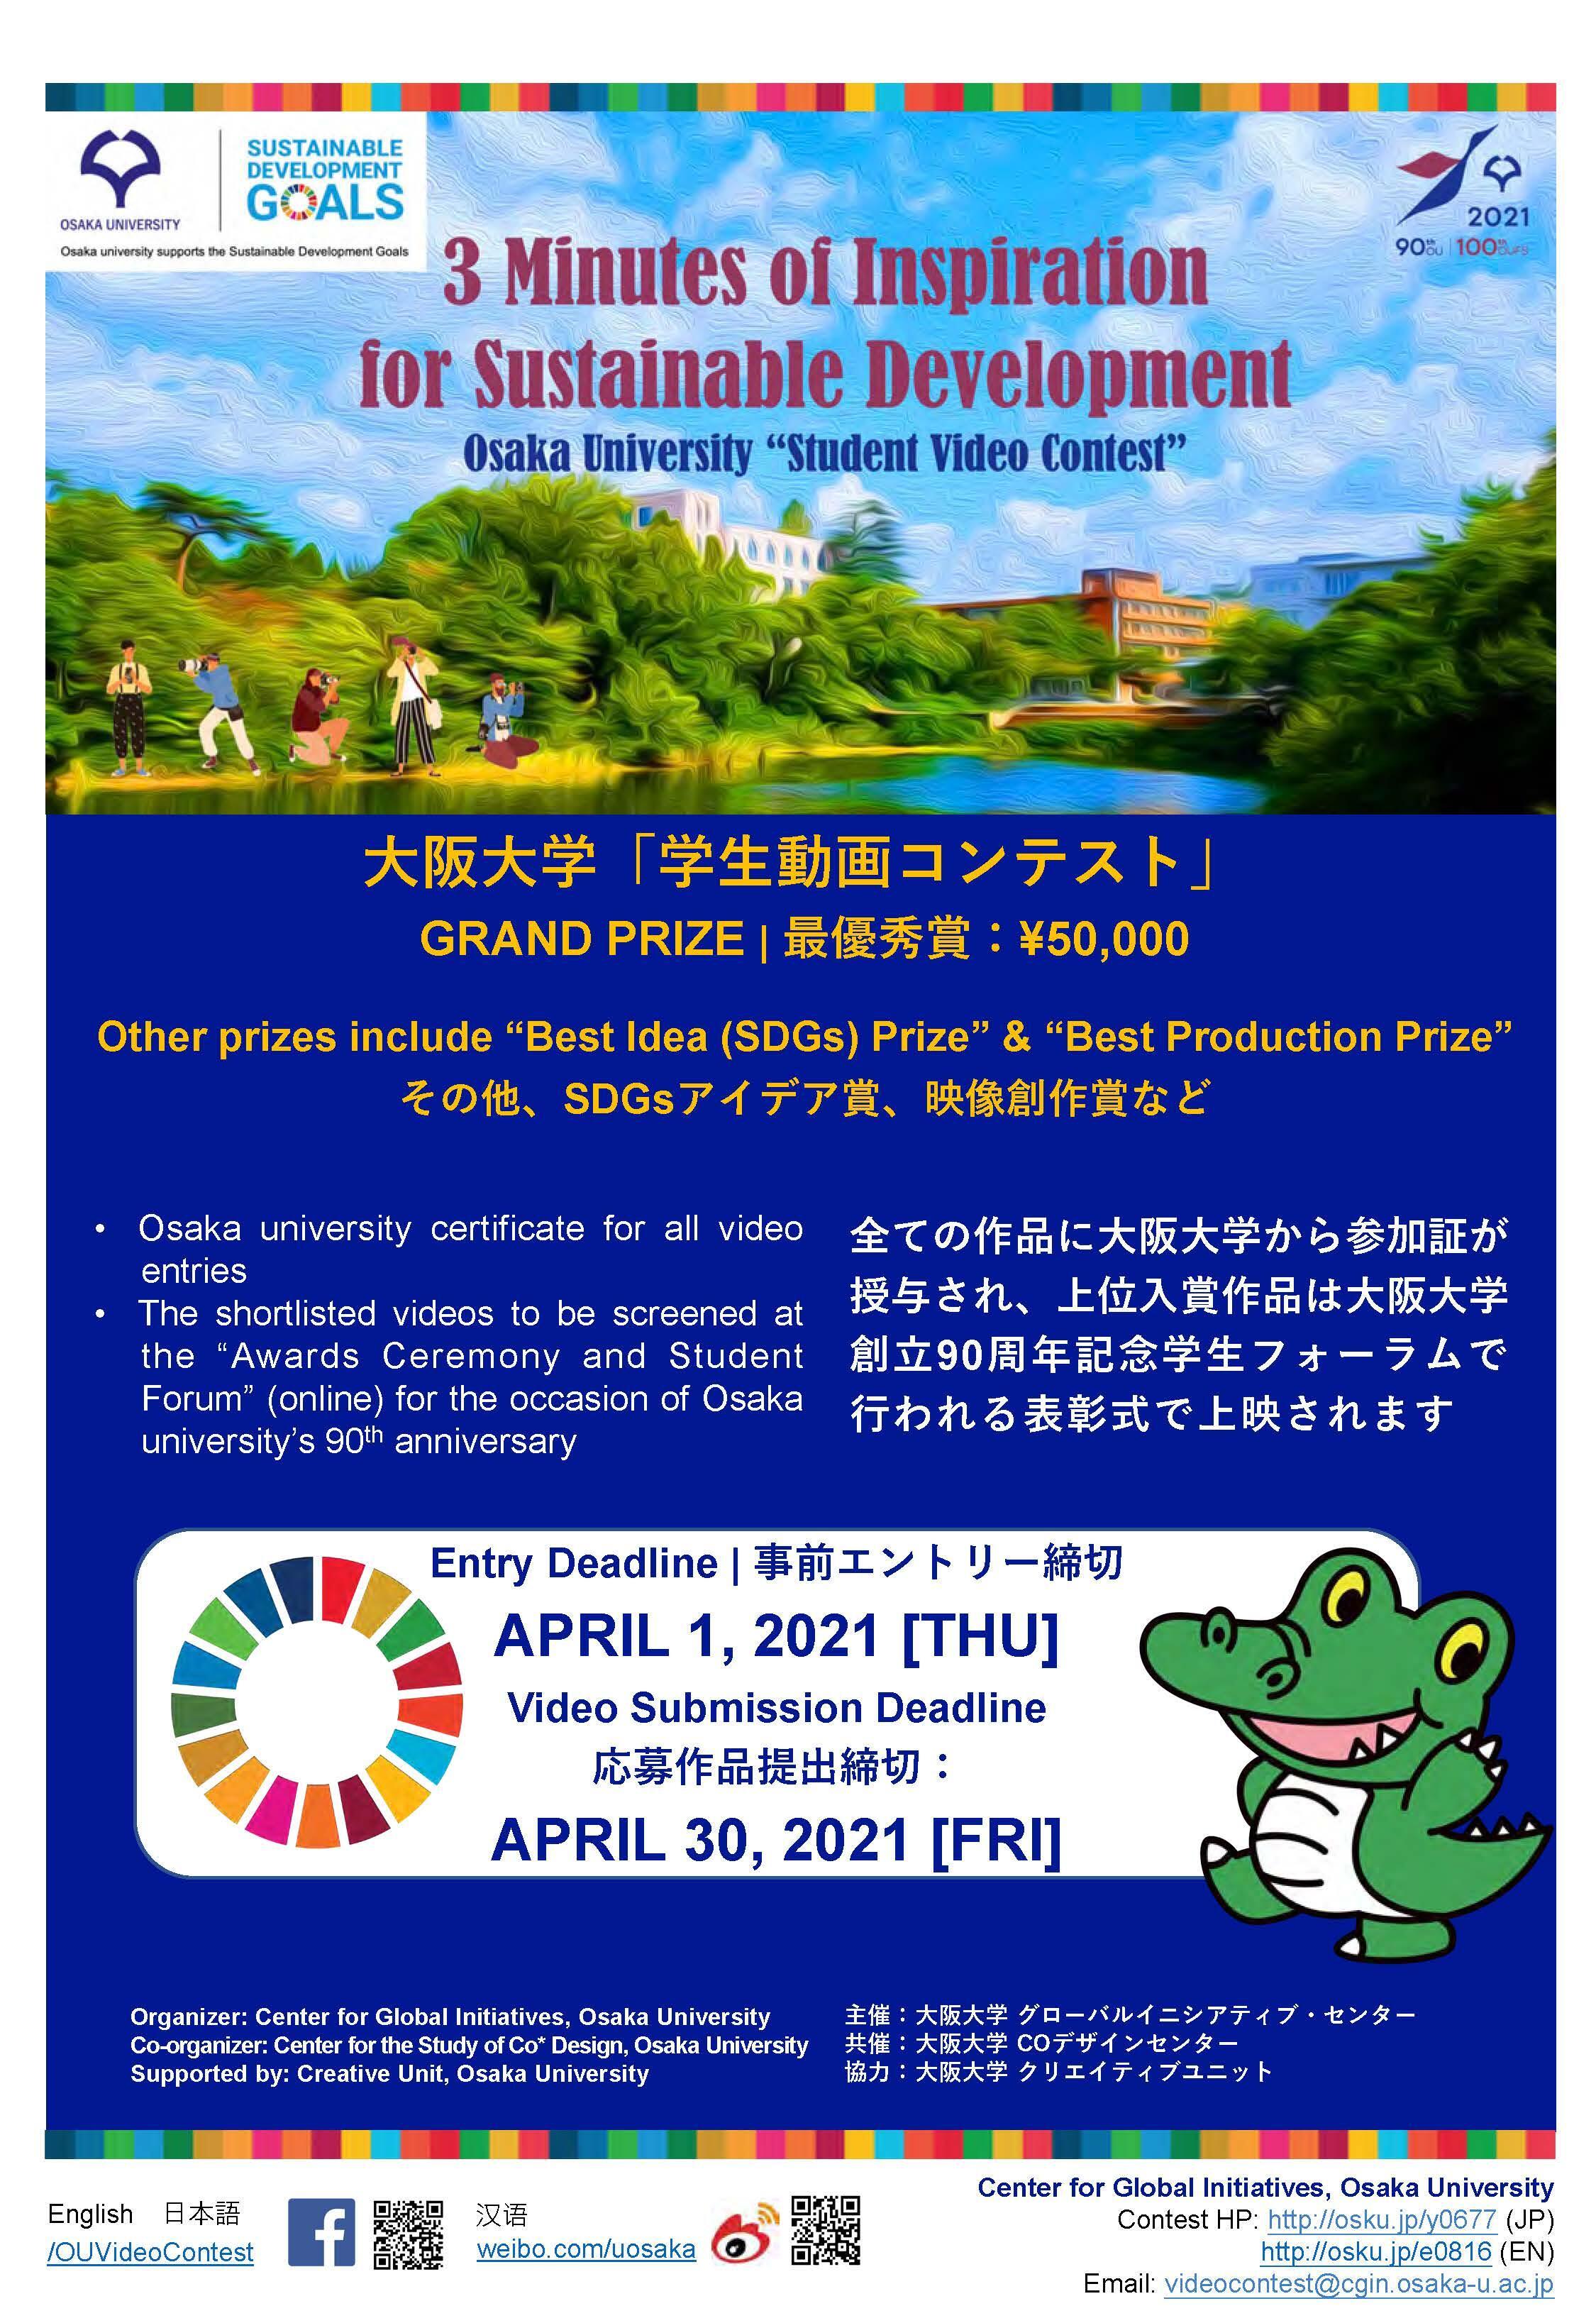 210312_OsakaUniversityStudent VideoContestFlyer_p01.jpg